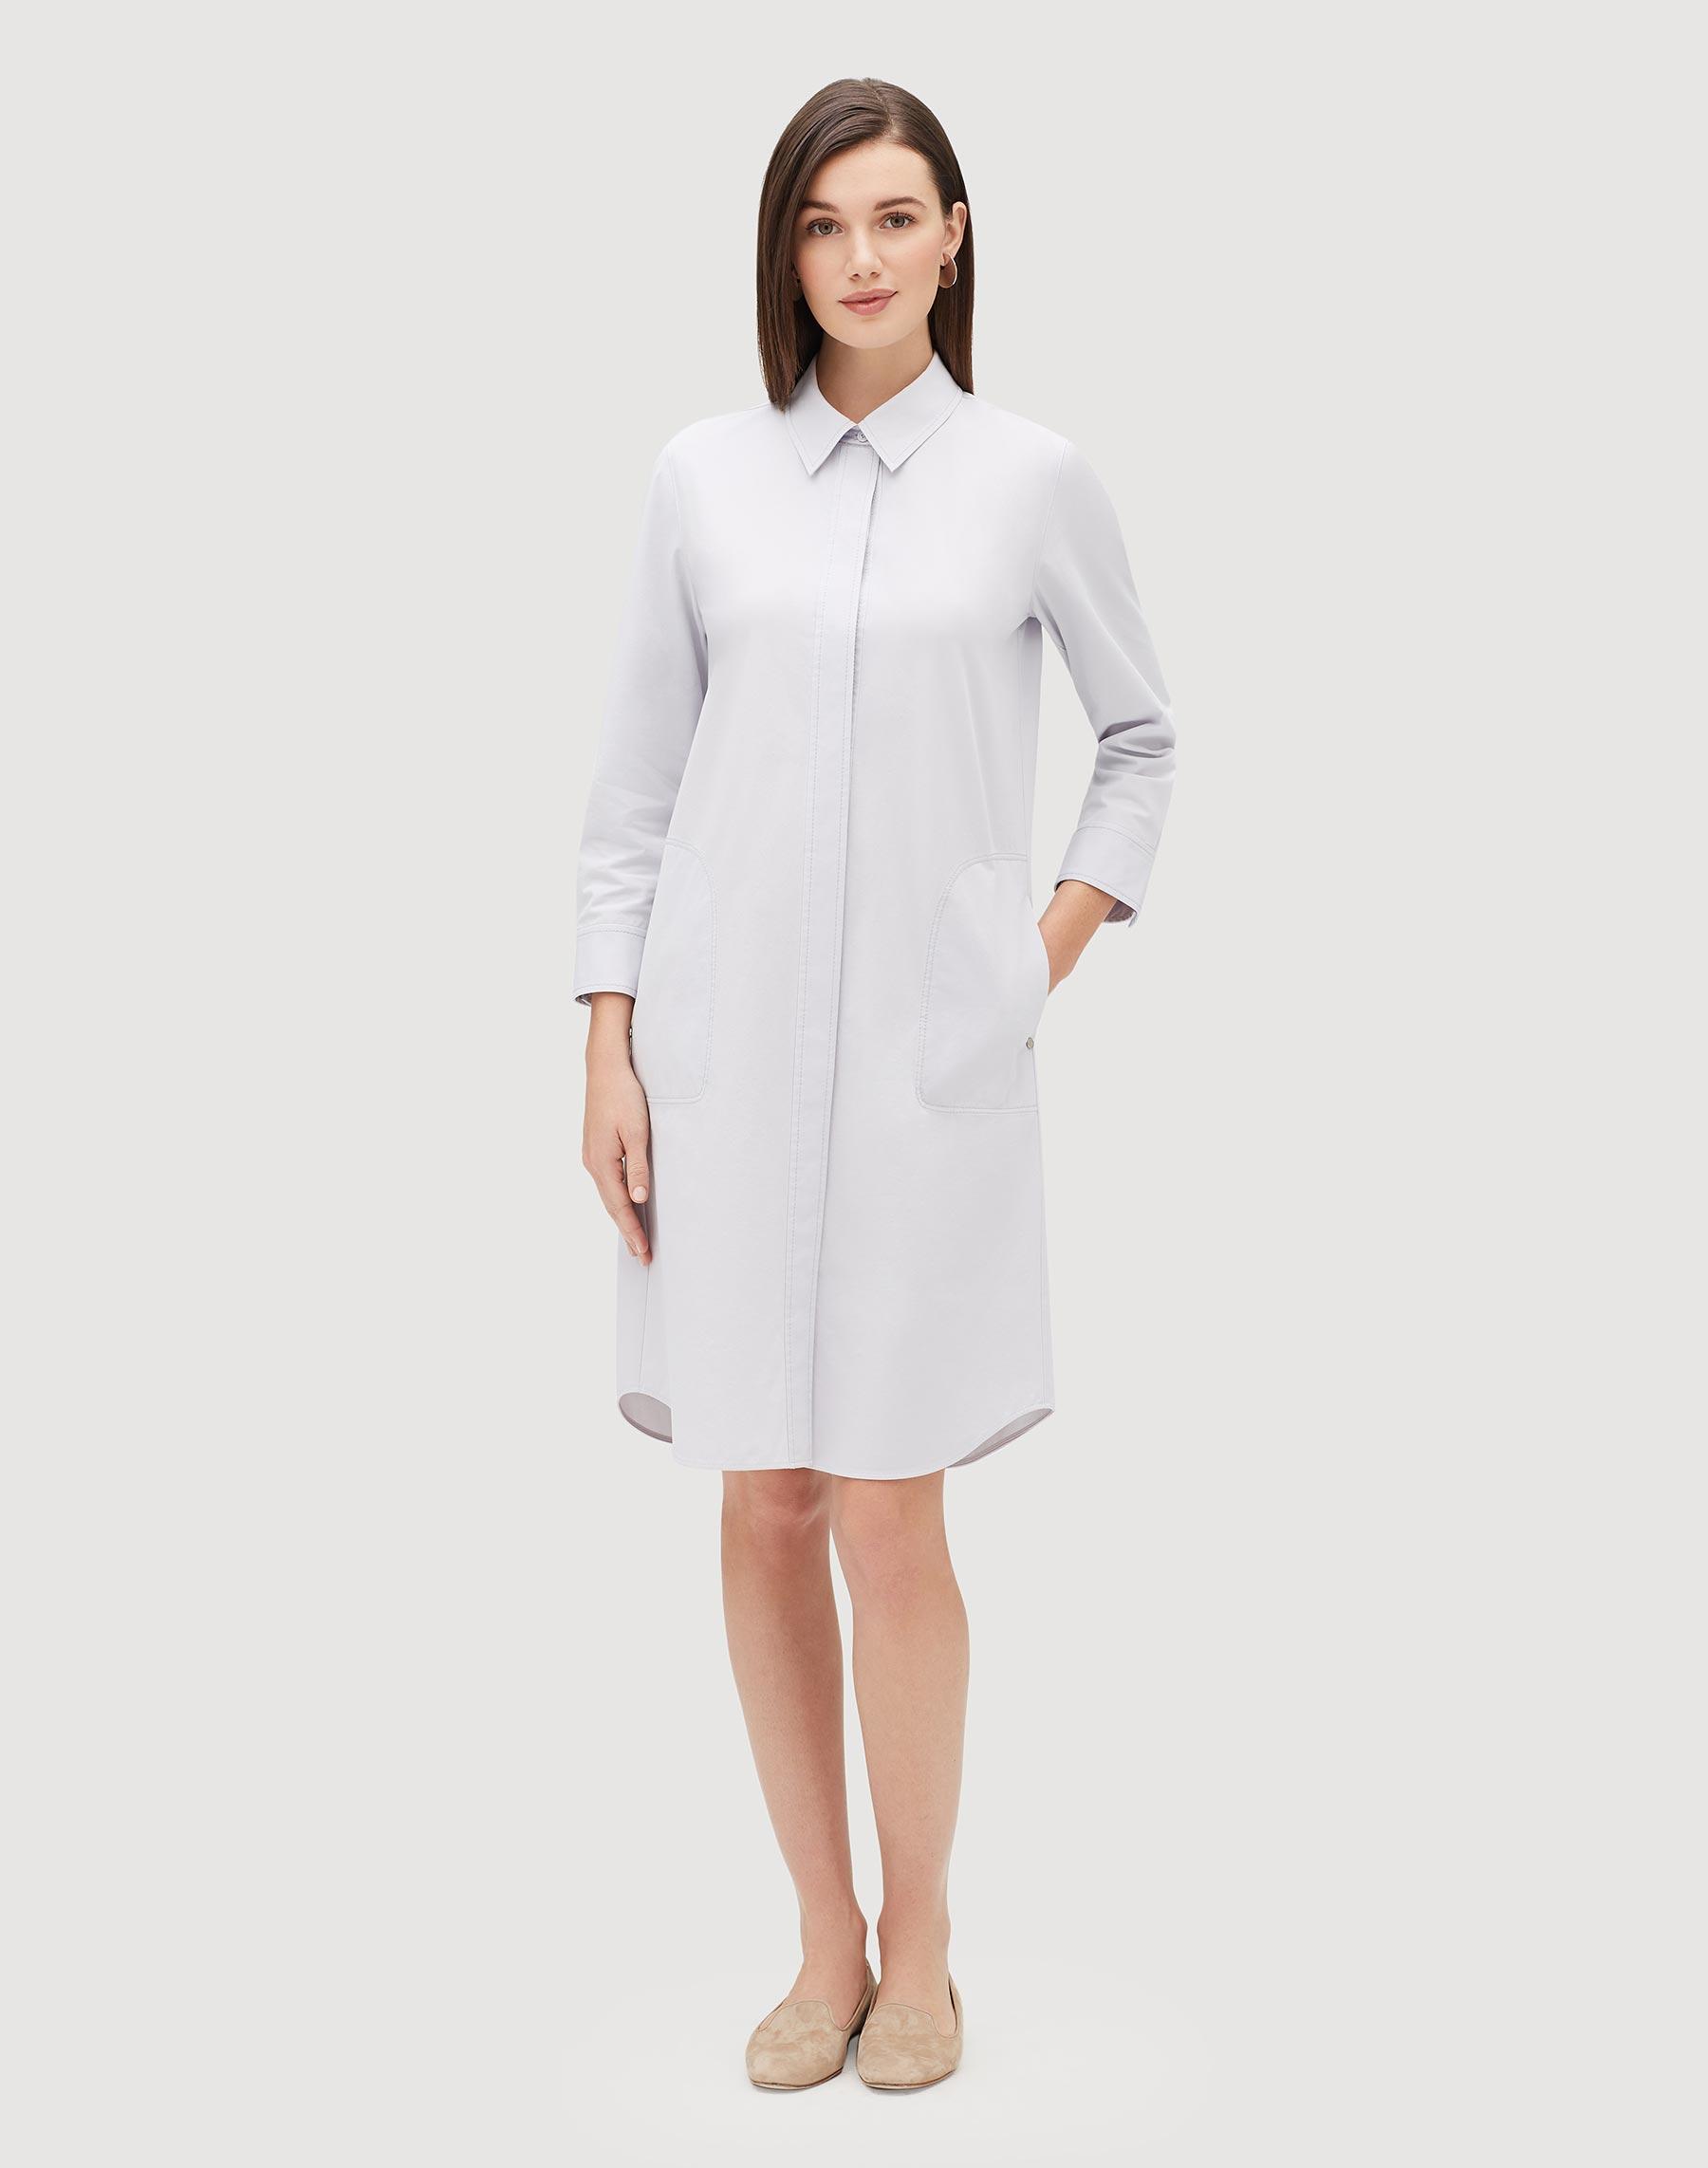 Plus Size Designer Clothes Lafayette 148 New York